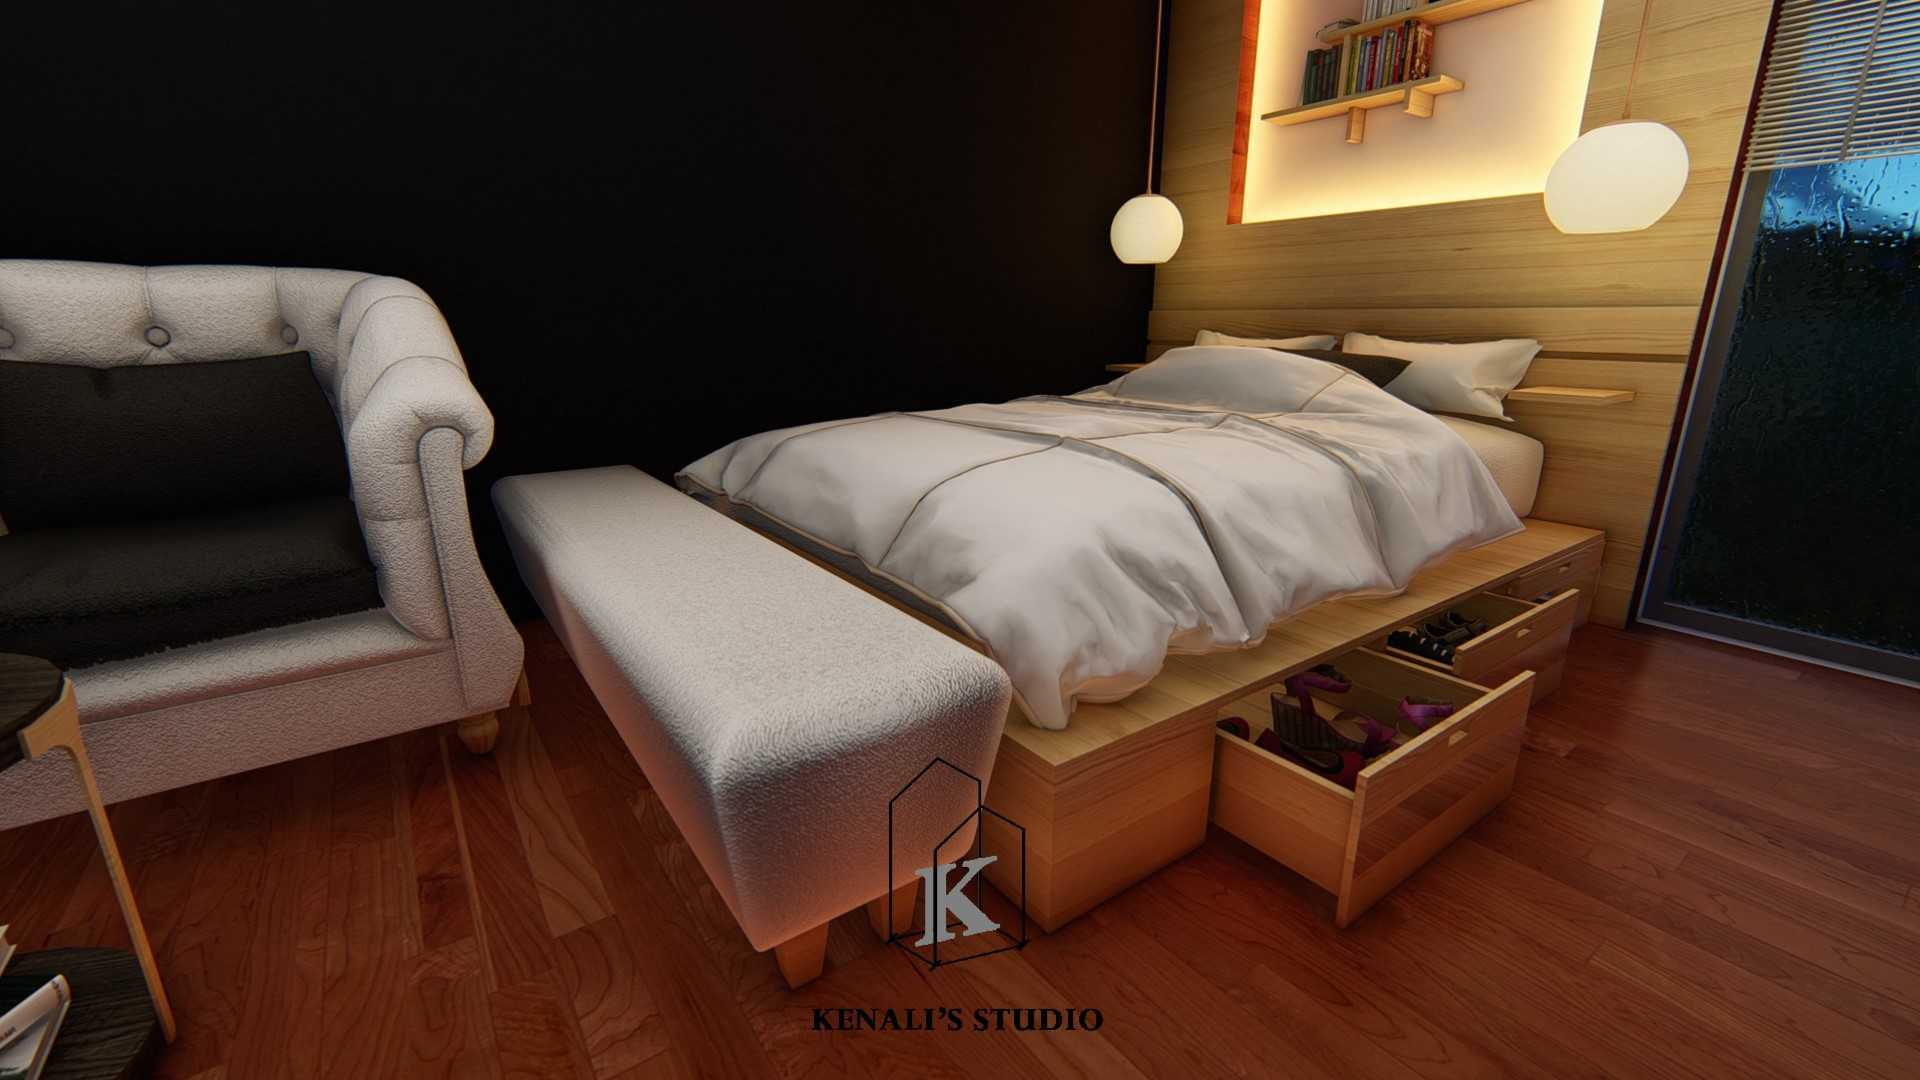 Kenali's Studio Project : Lowlit Bedroom Italia Italia Kenalis-Studio-Project-Lowlit-Bedroom  72928